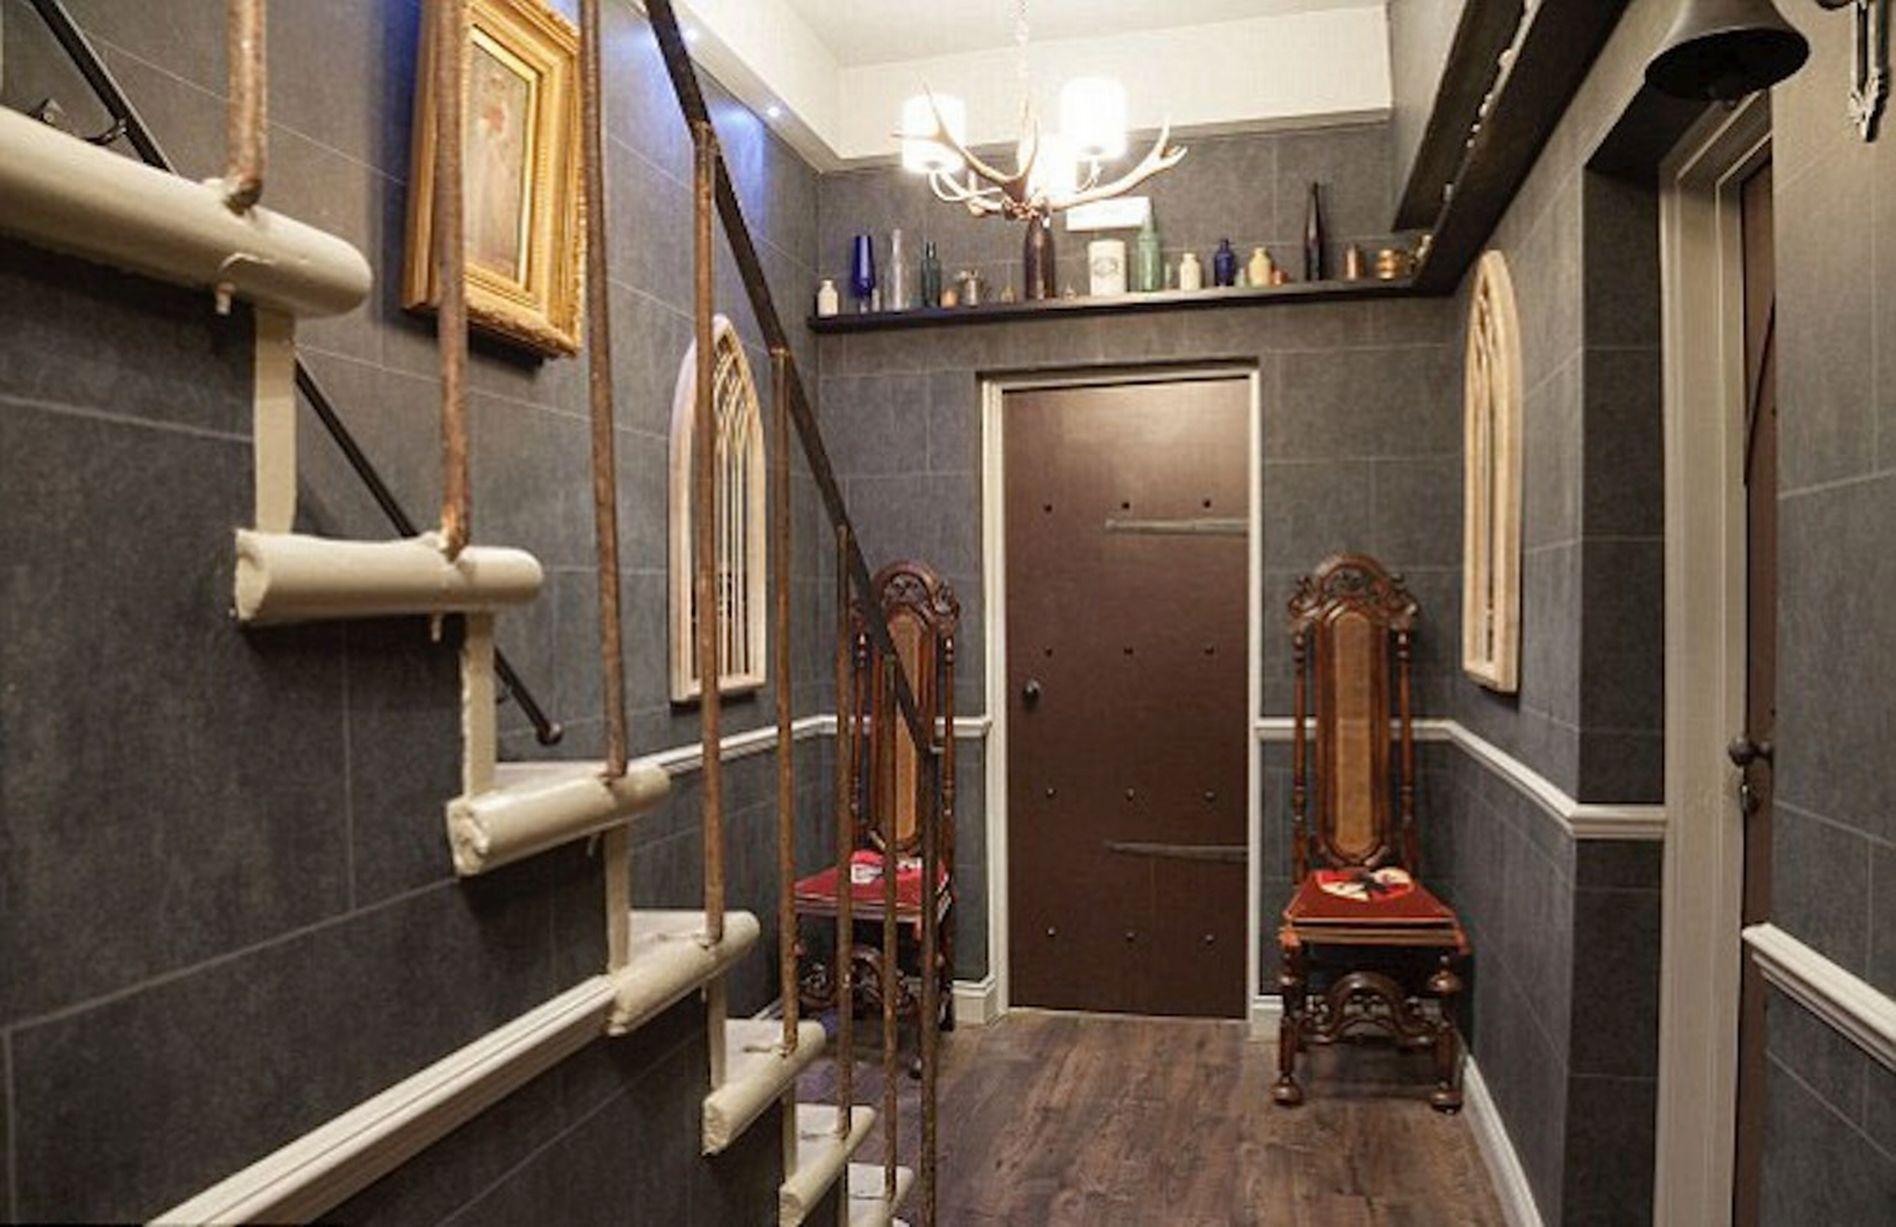 Harry_Potter_Themed_Hotel_Room_London.jpeg